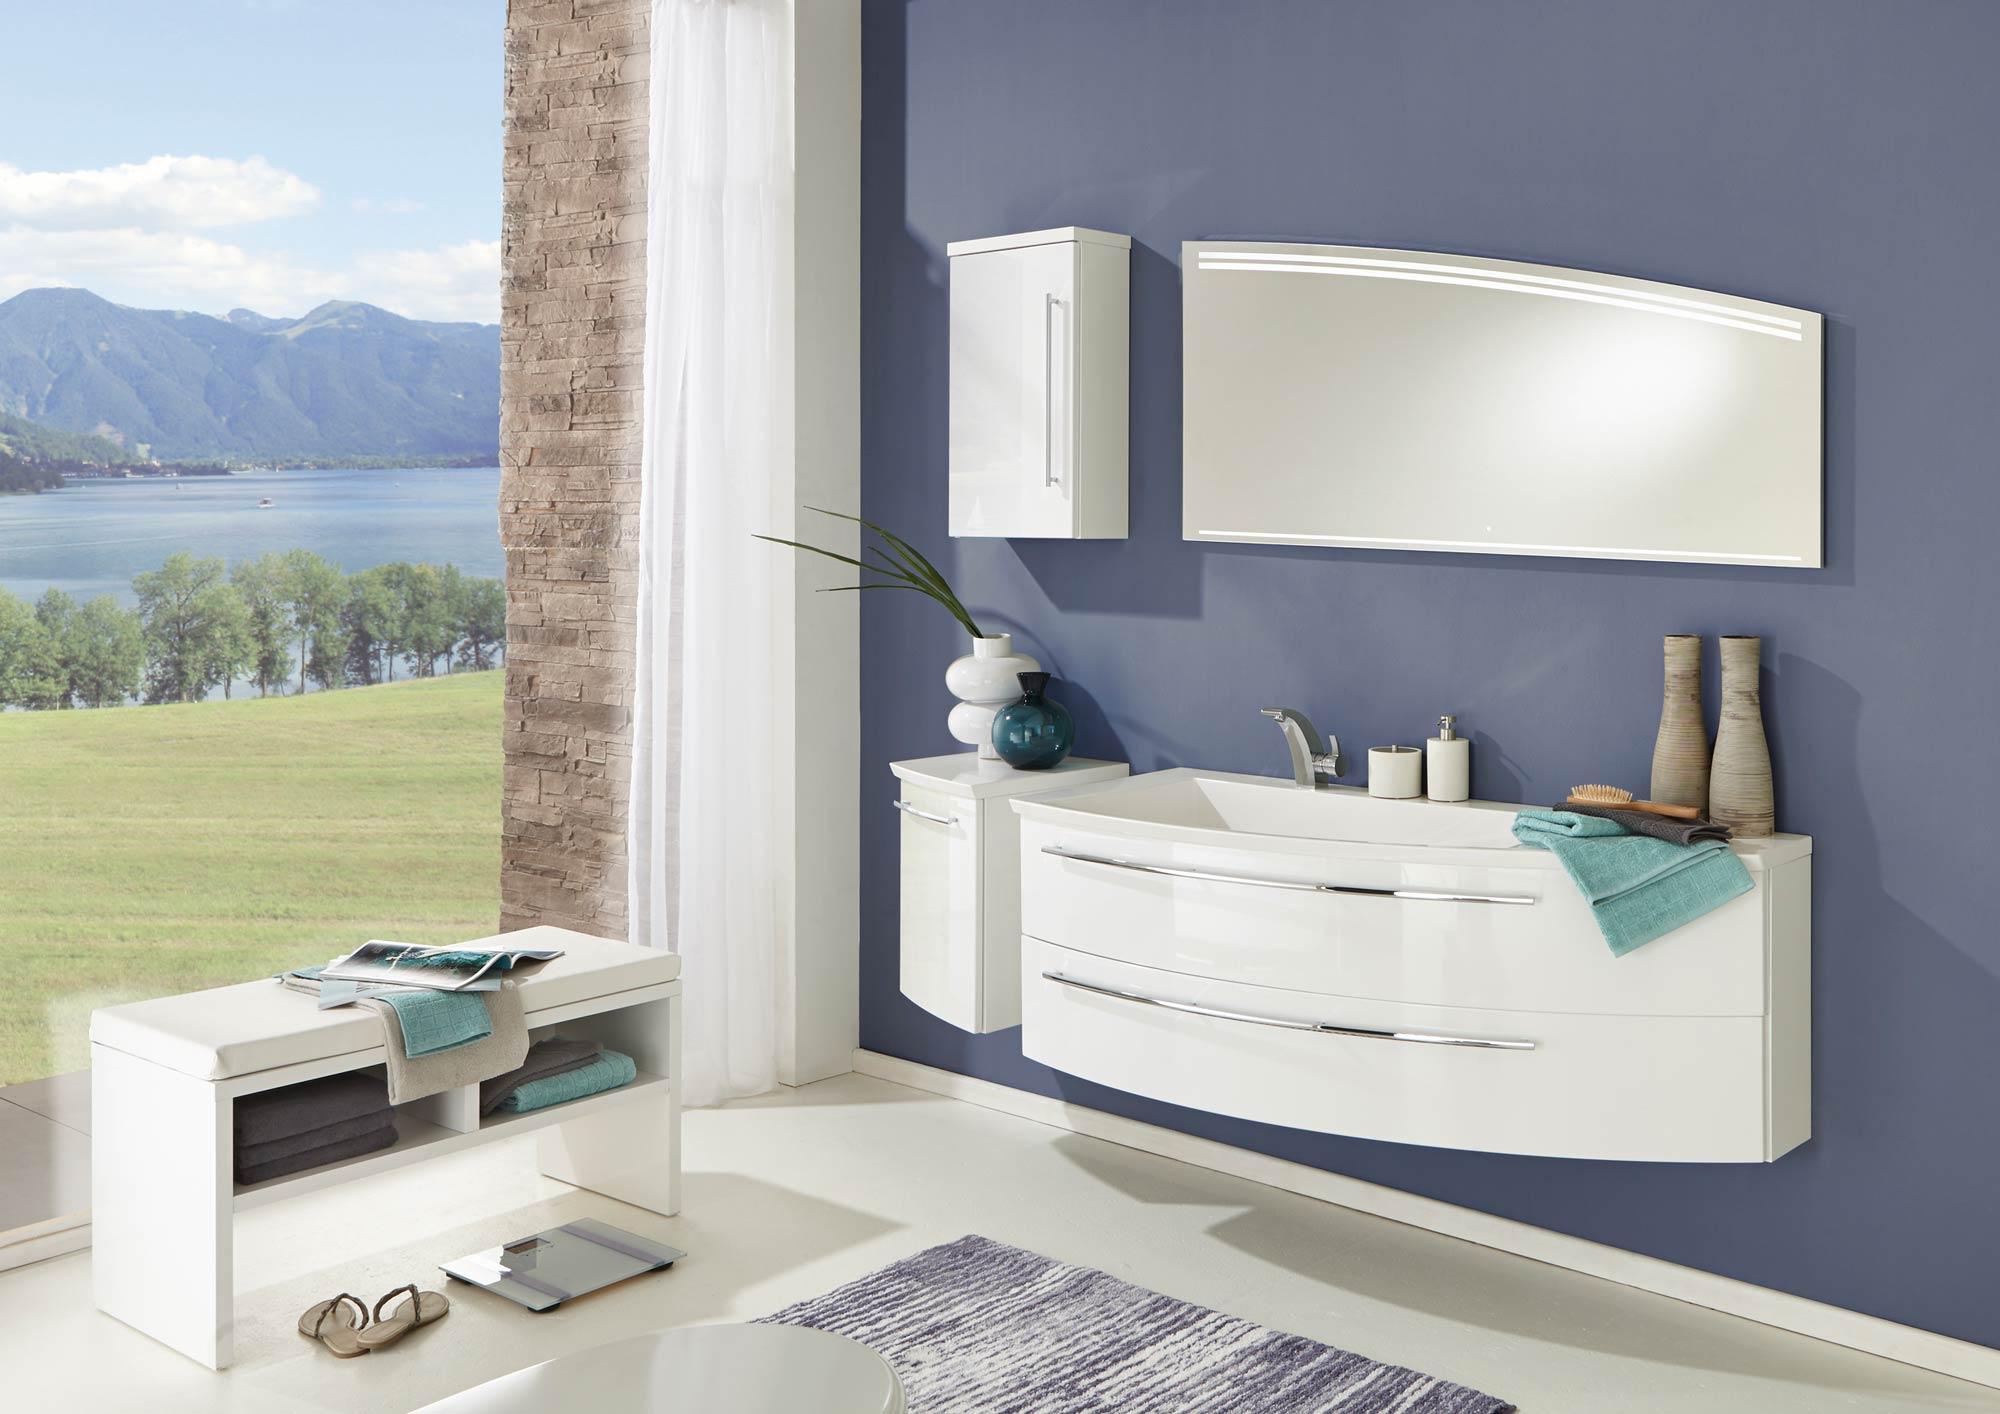 collection crescendo largeur 140 cm blanc brillant plan en marbre reconstitue brillant